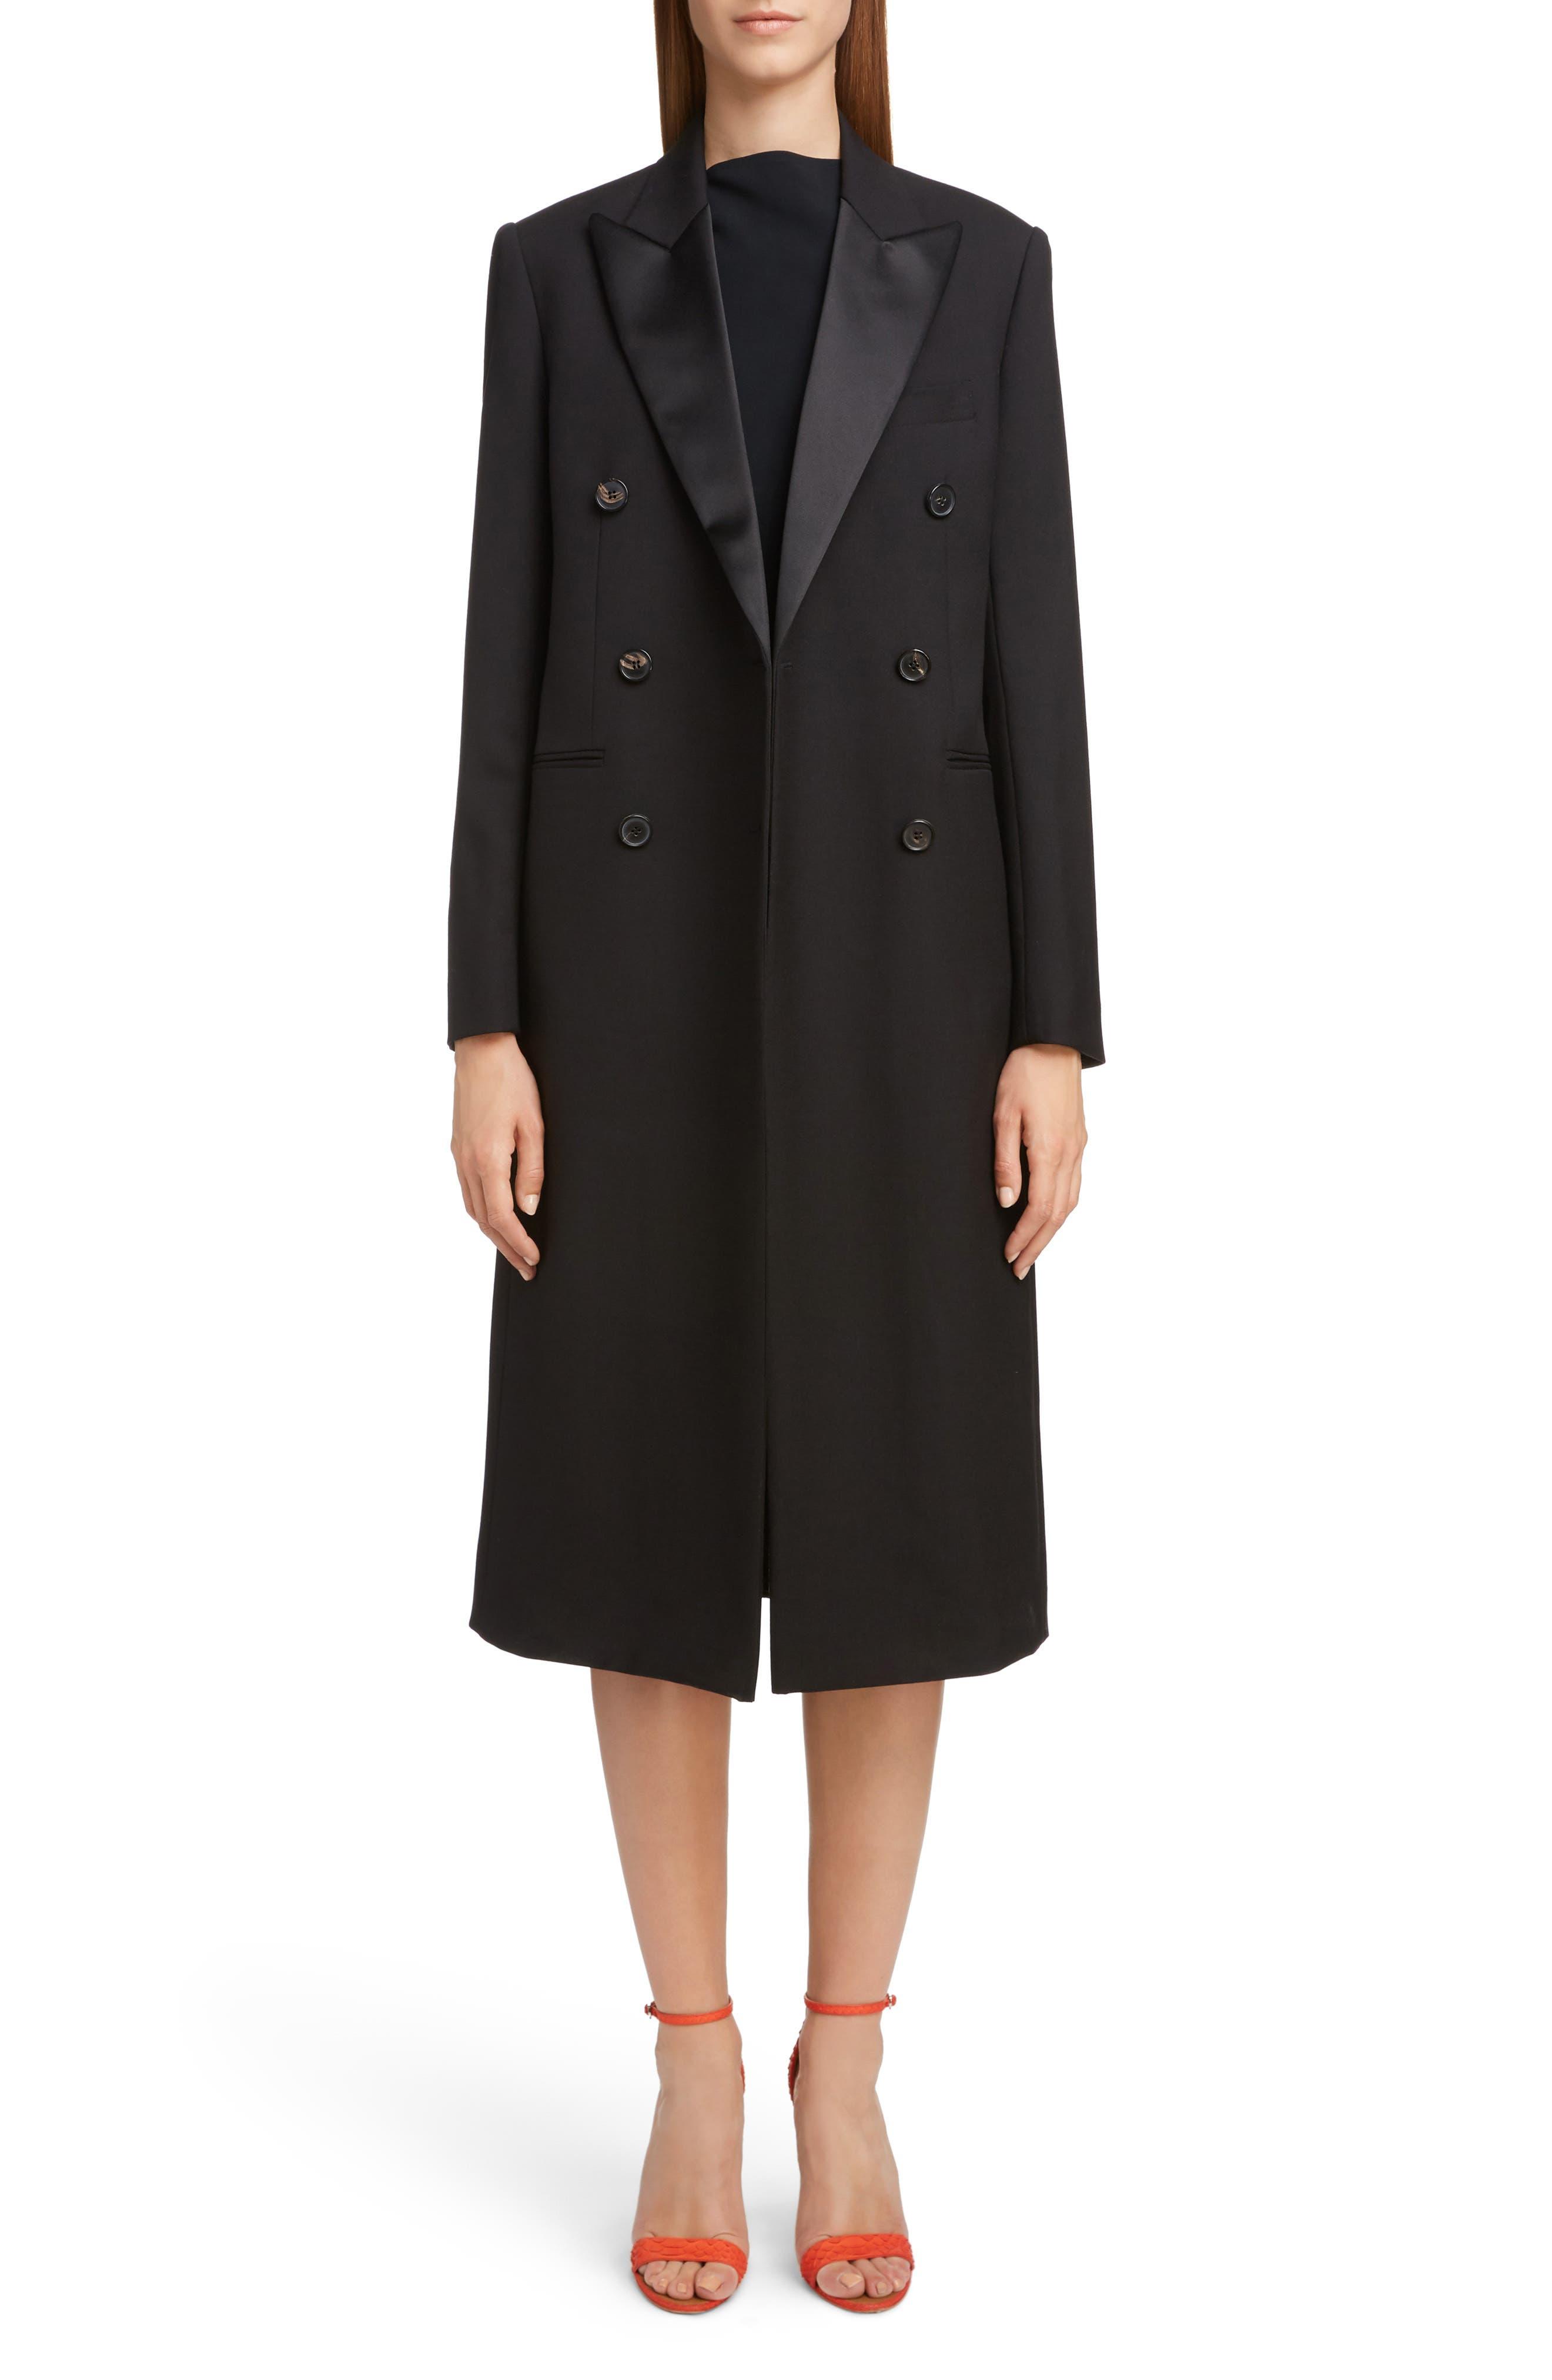 VICTORIA BECKHAM, Wool & Mohair Tuxedo Coat, Main thumbnail 1, color, BLACK